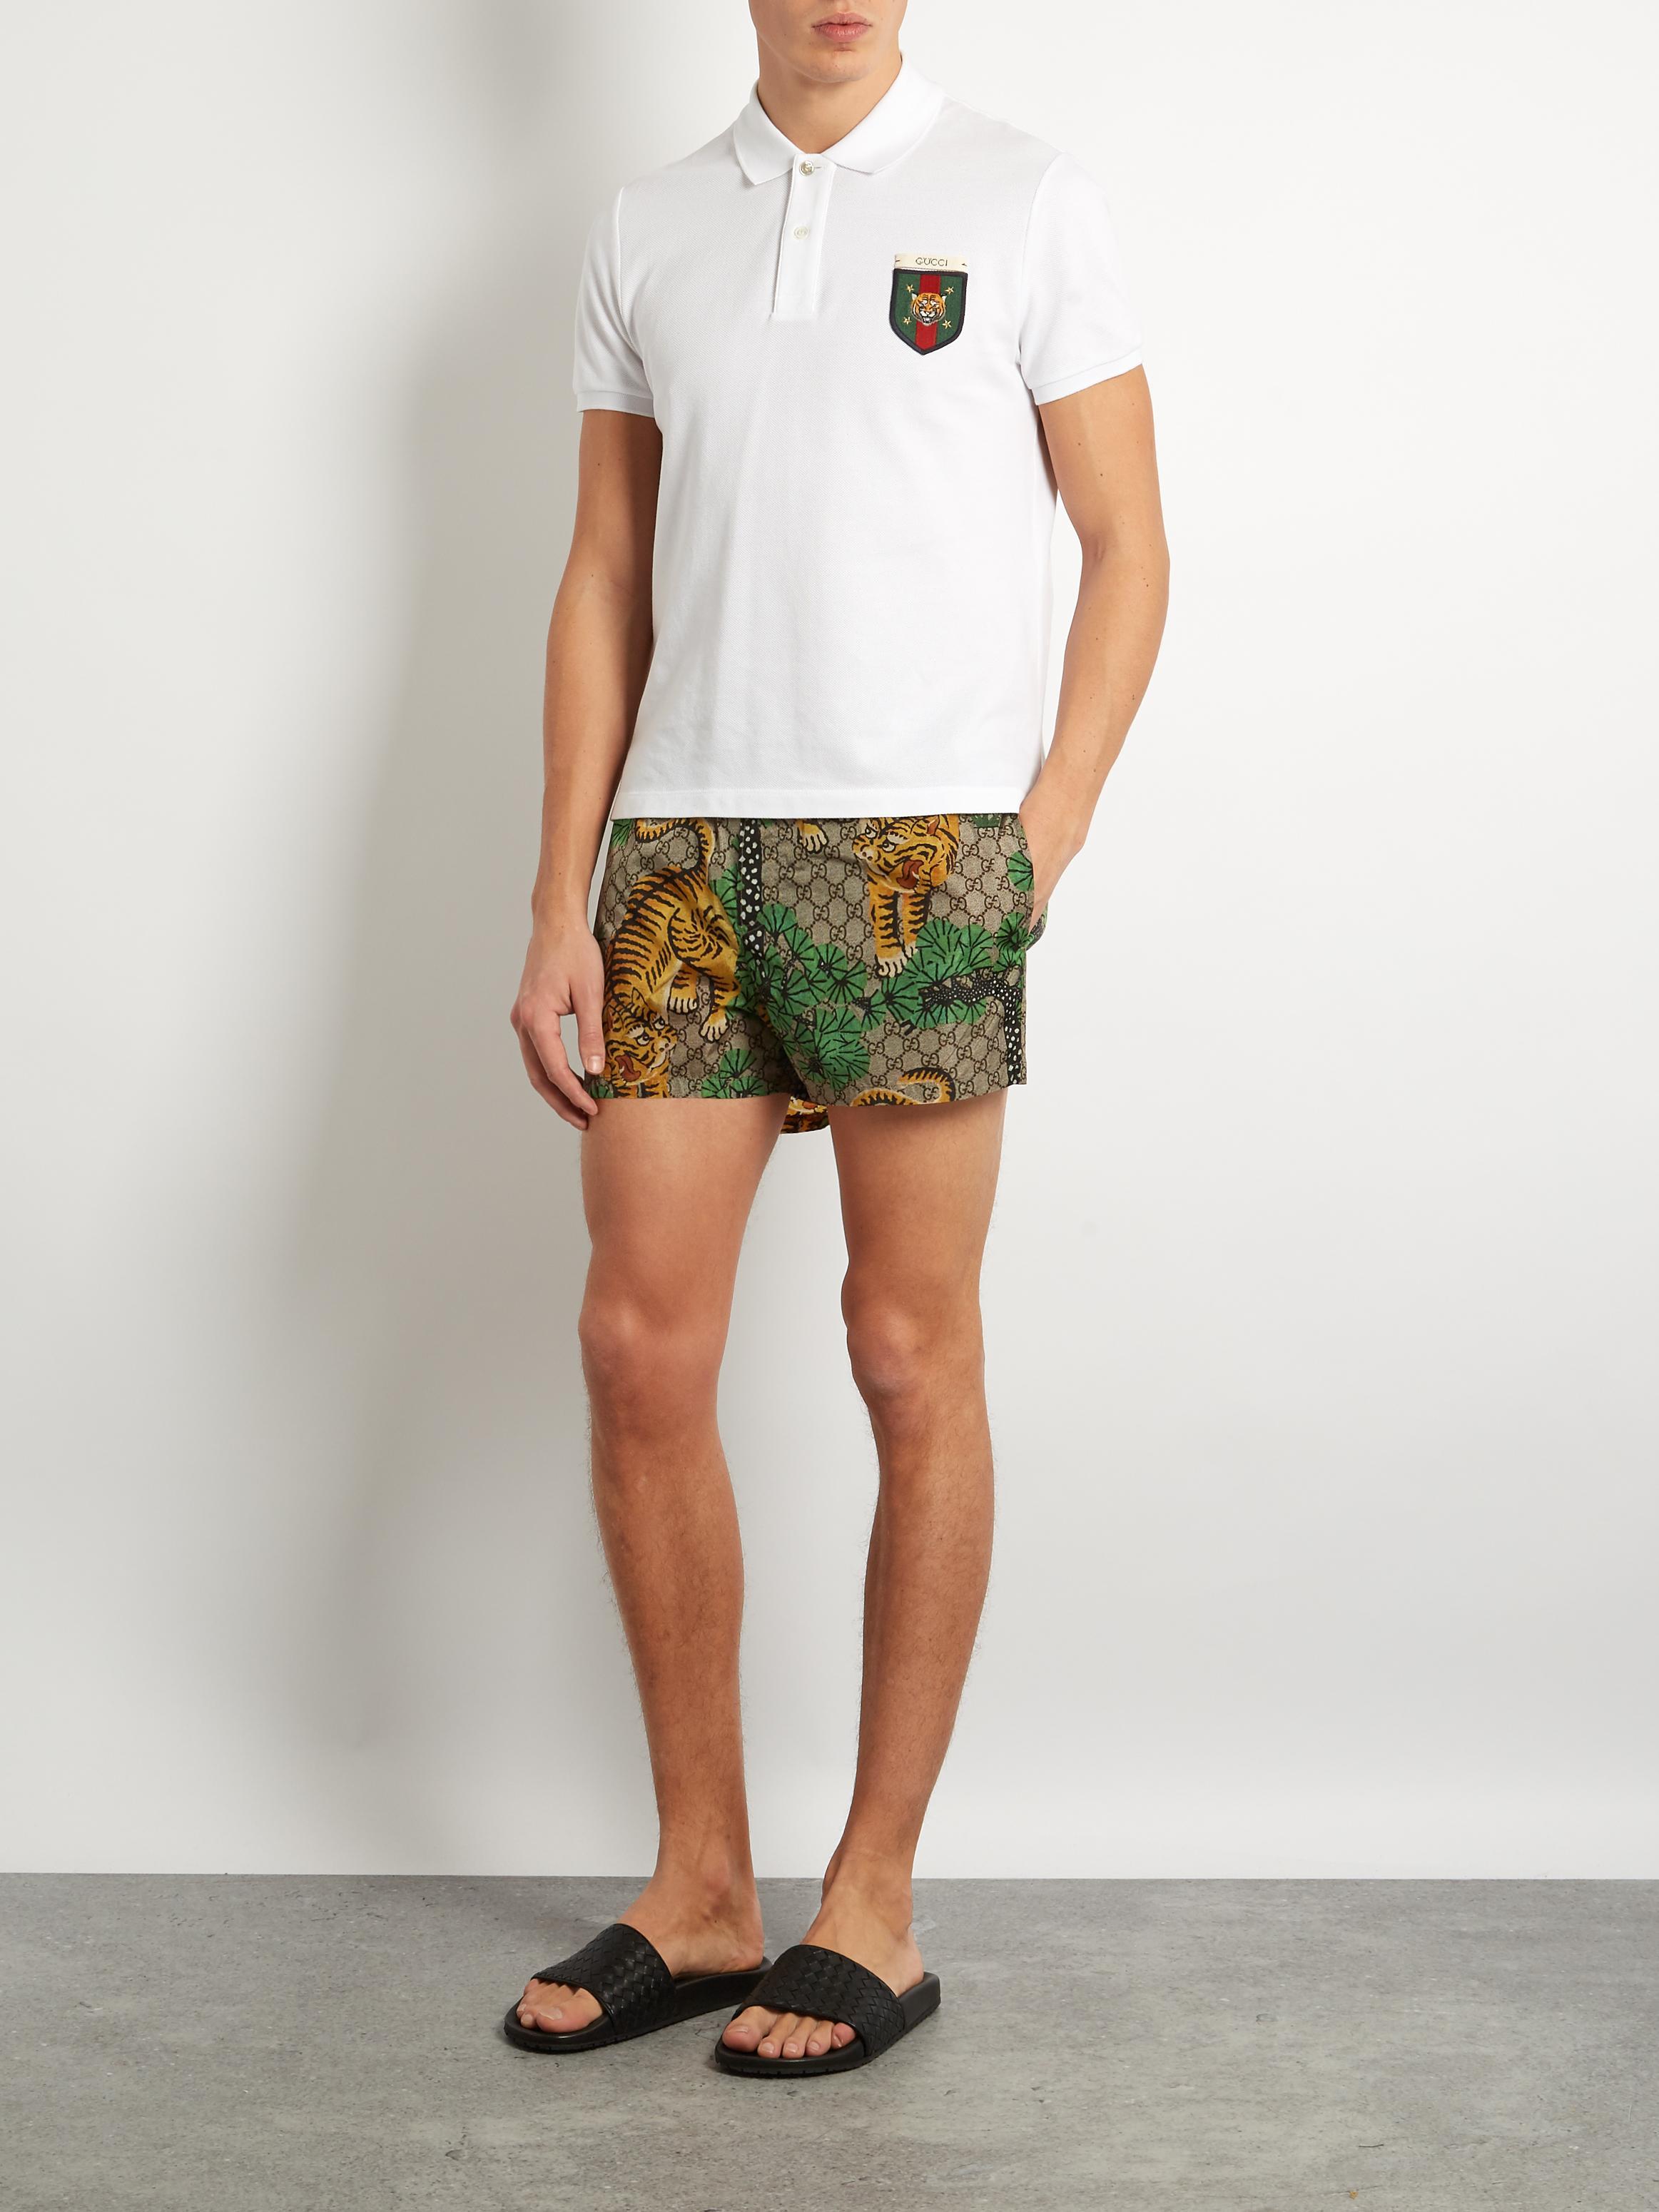 c8c57247a95 Gucci Mens Polo Shirts Uk